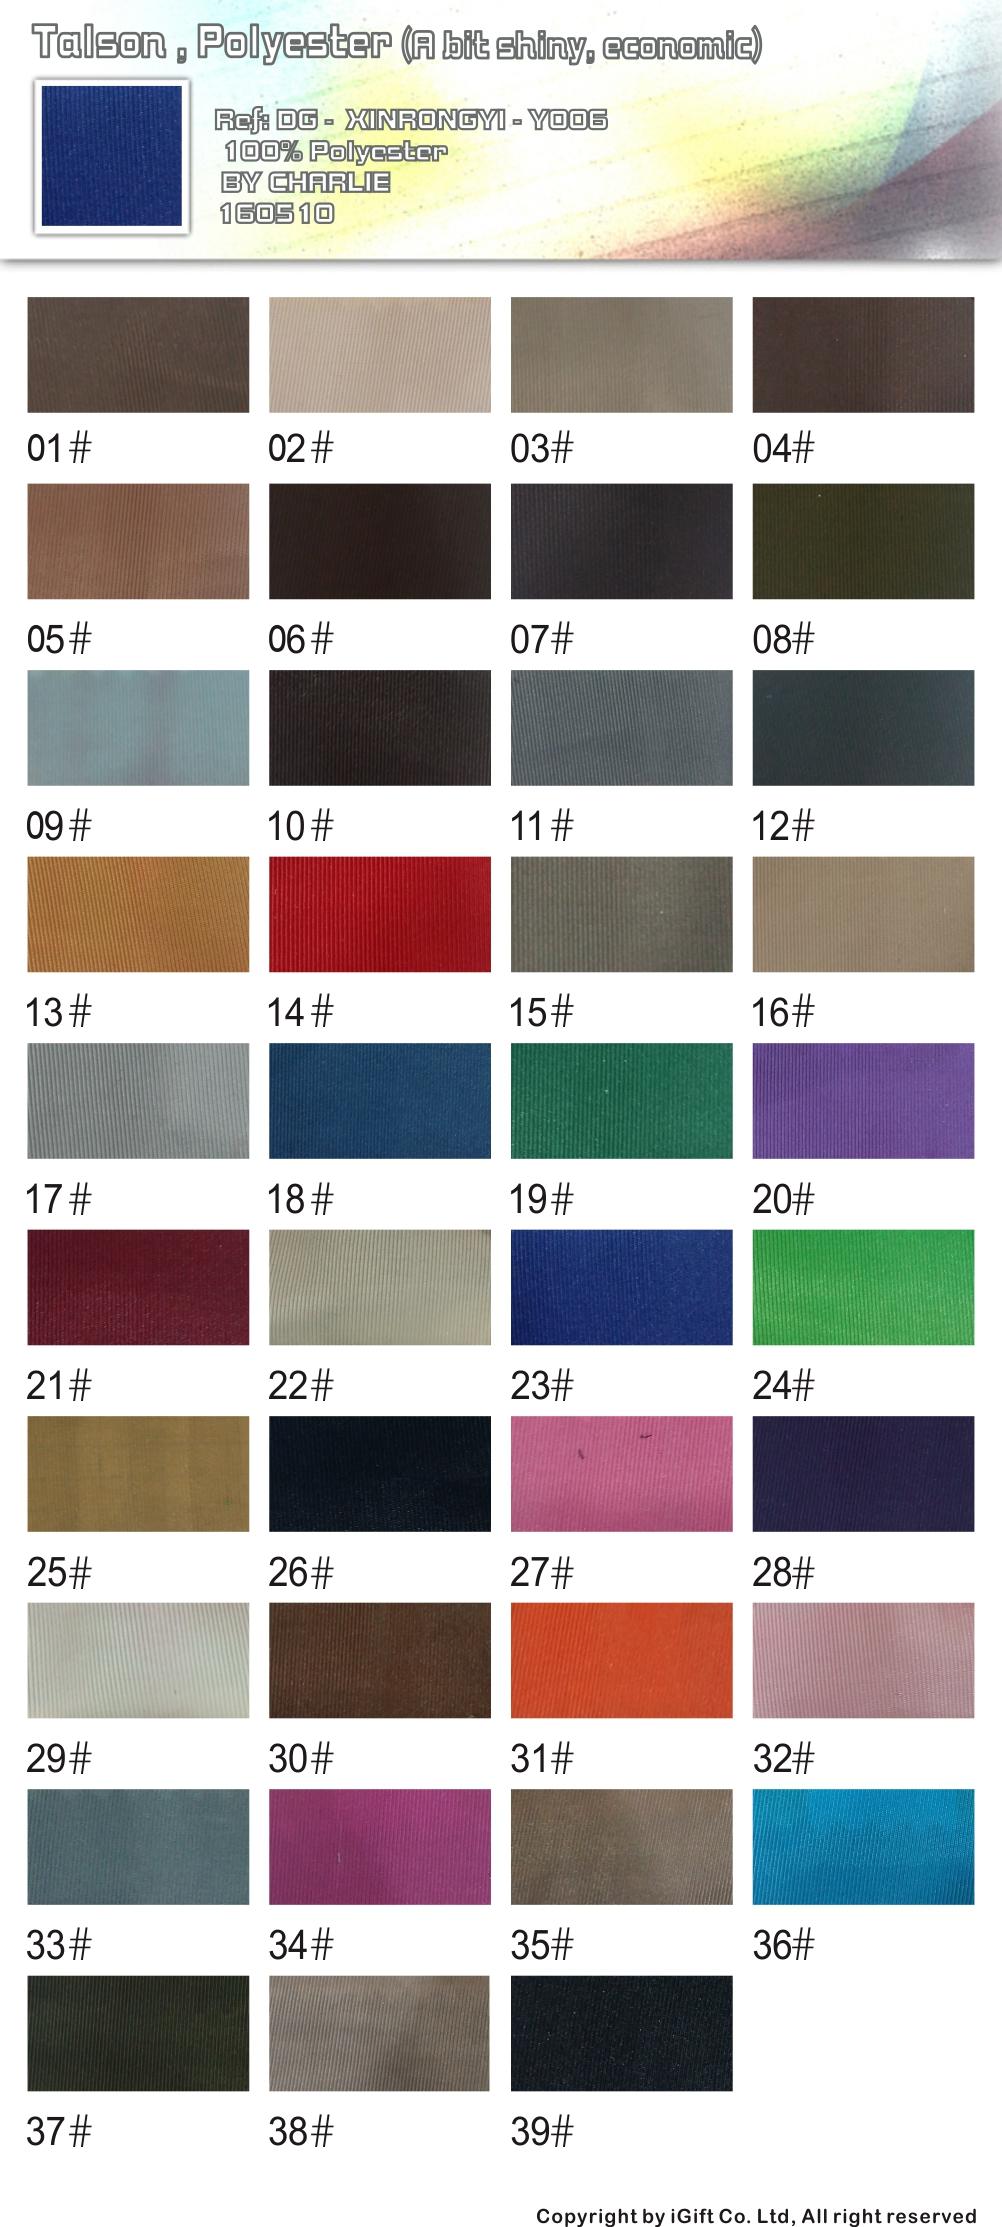 Talson,Polyester(A bit shiny,economic)   100%Polyester  BY CHRRLIE